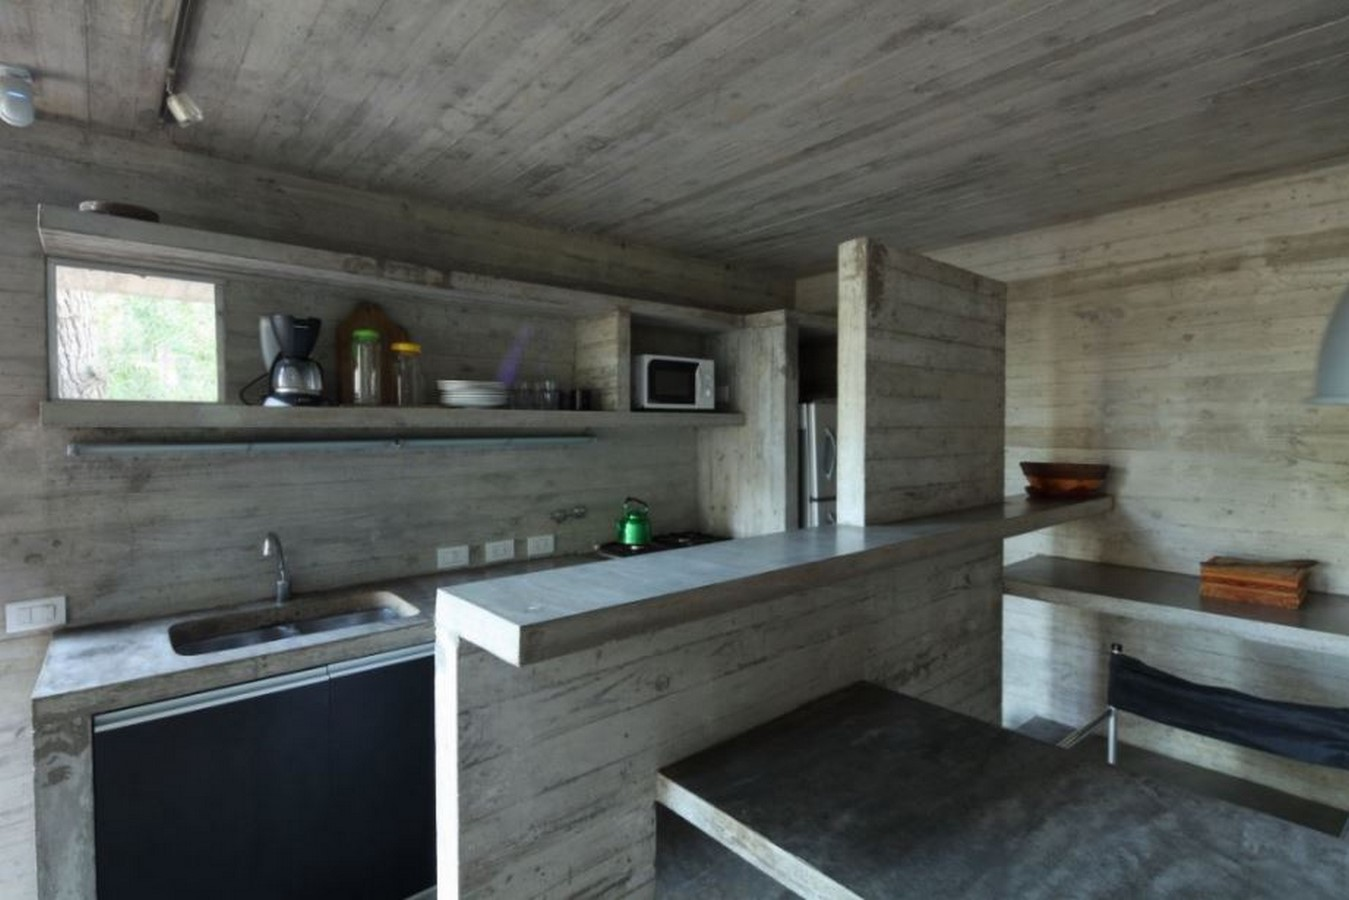 Kitchen in concrete